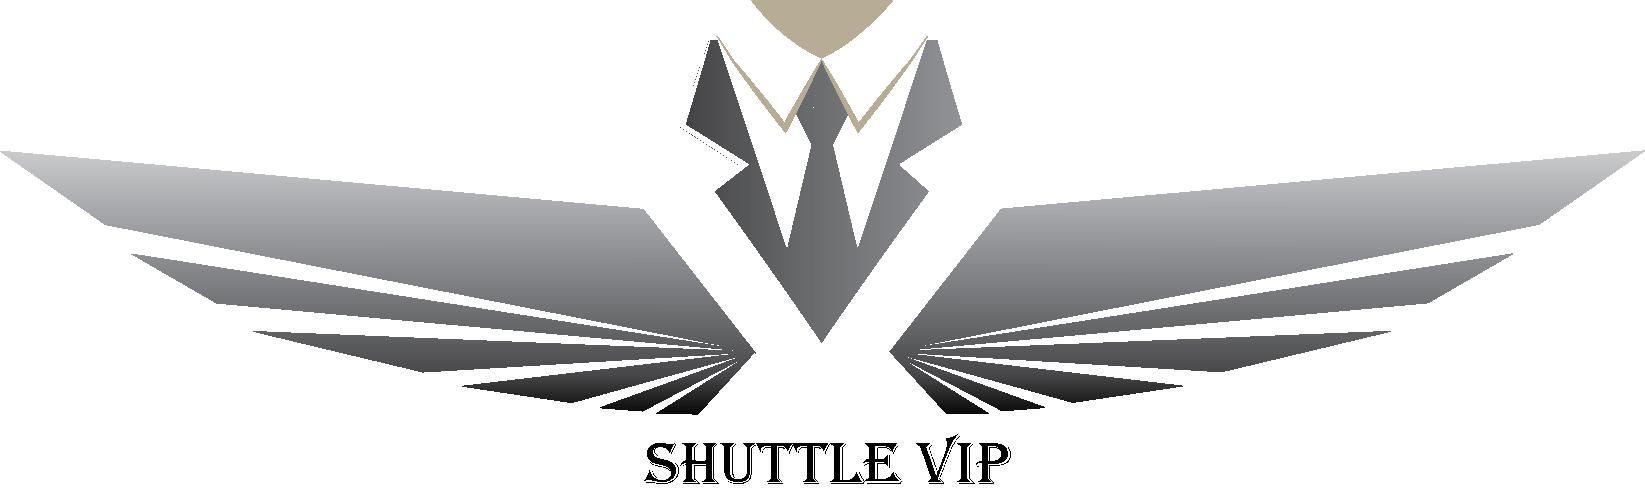 logo_ShuttleVip